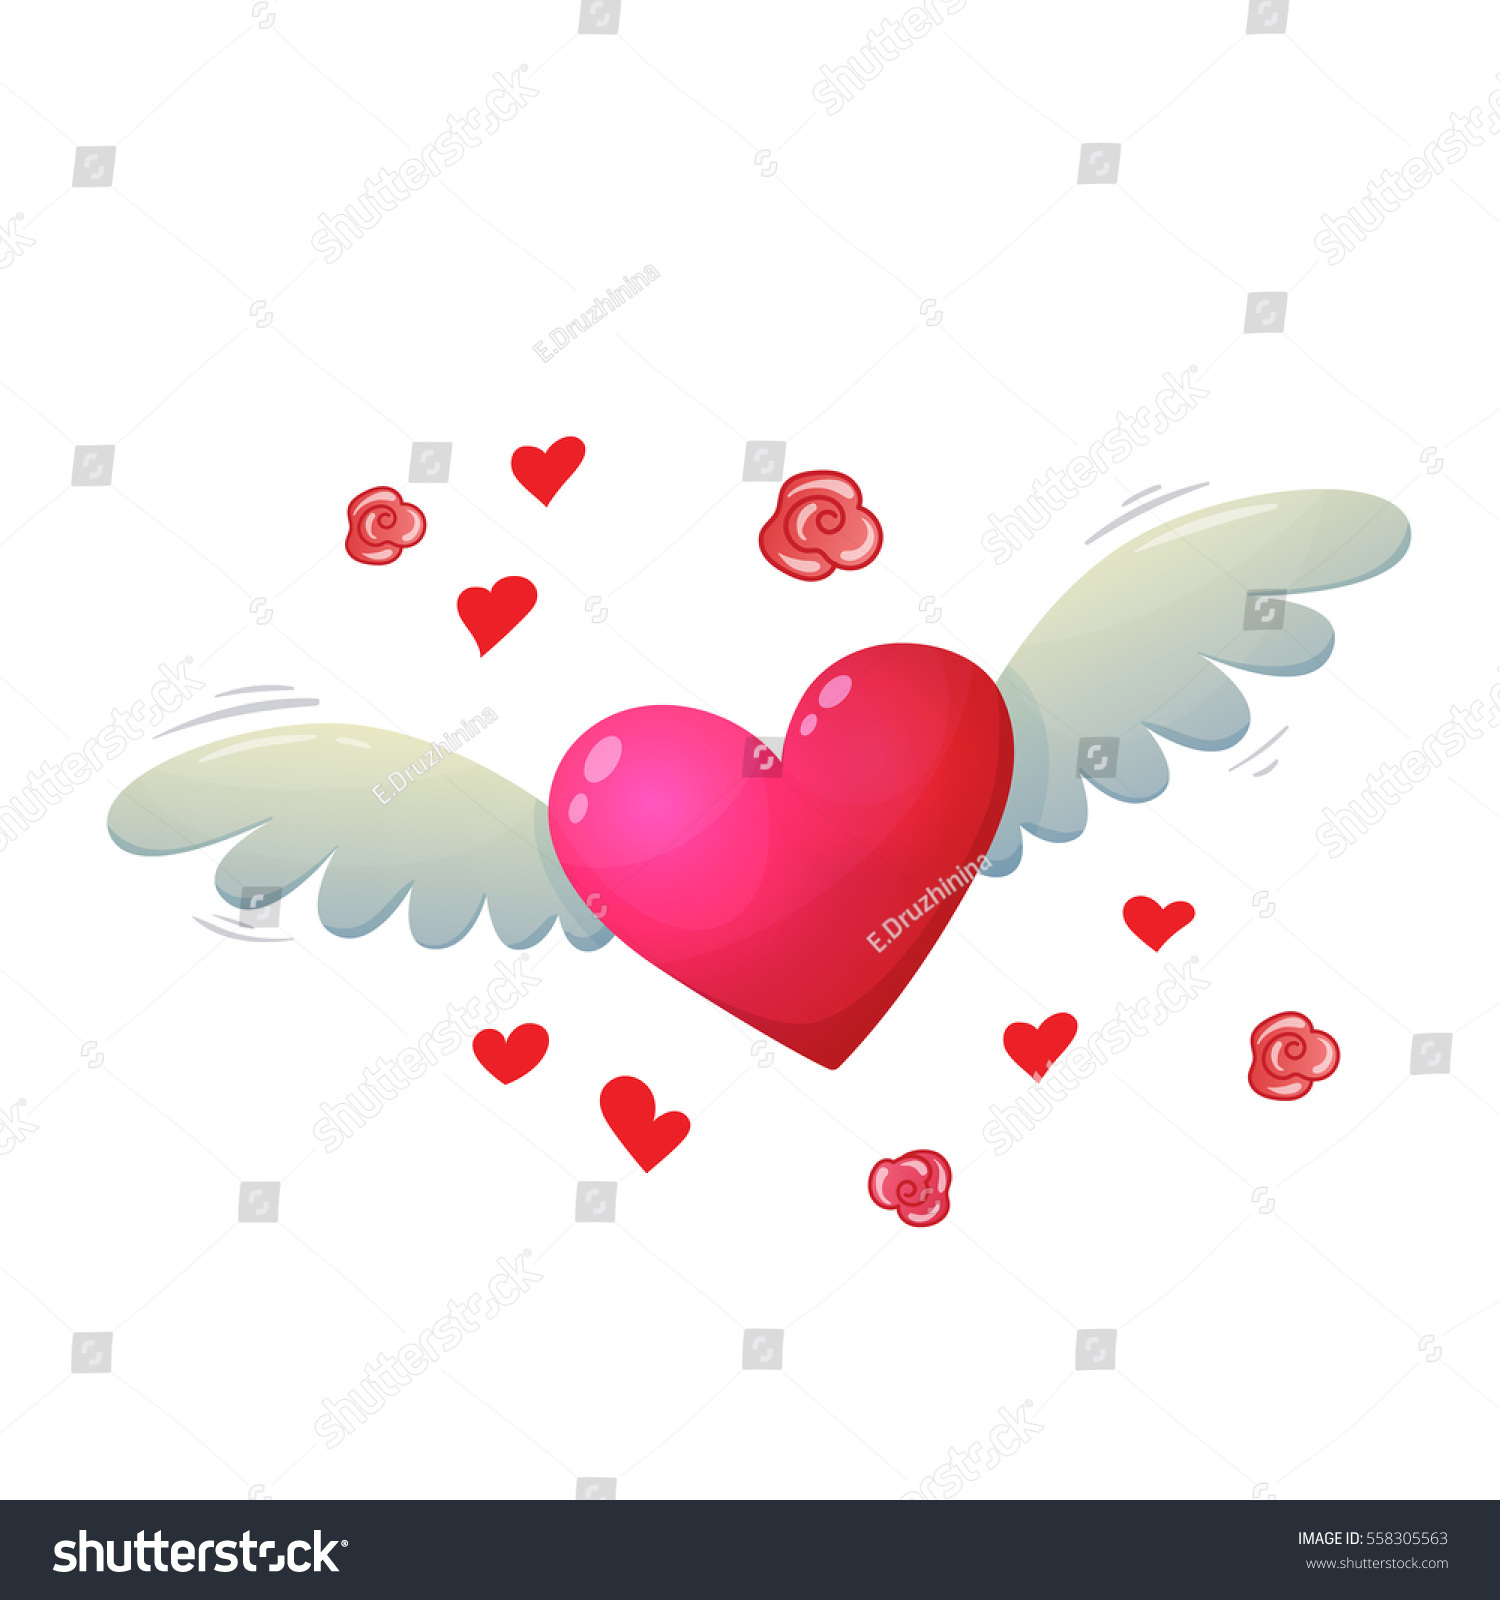 Colorful Cartoon Illustration Heart Wings Symbol Stock Vector